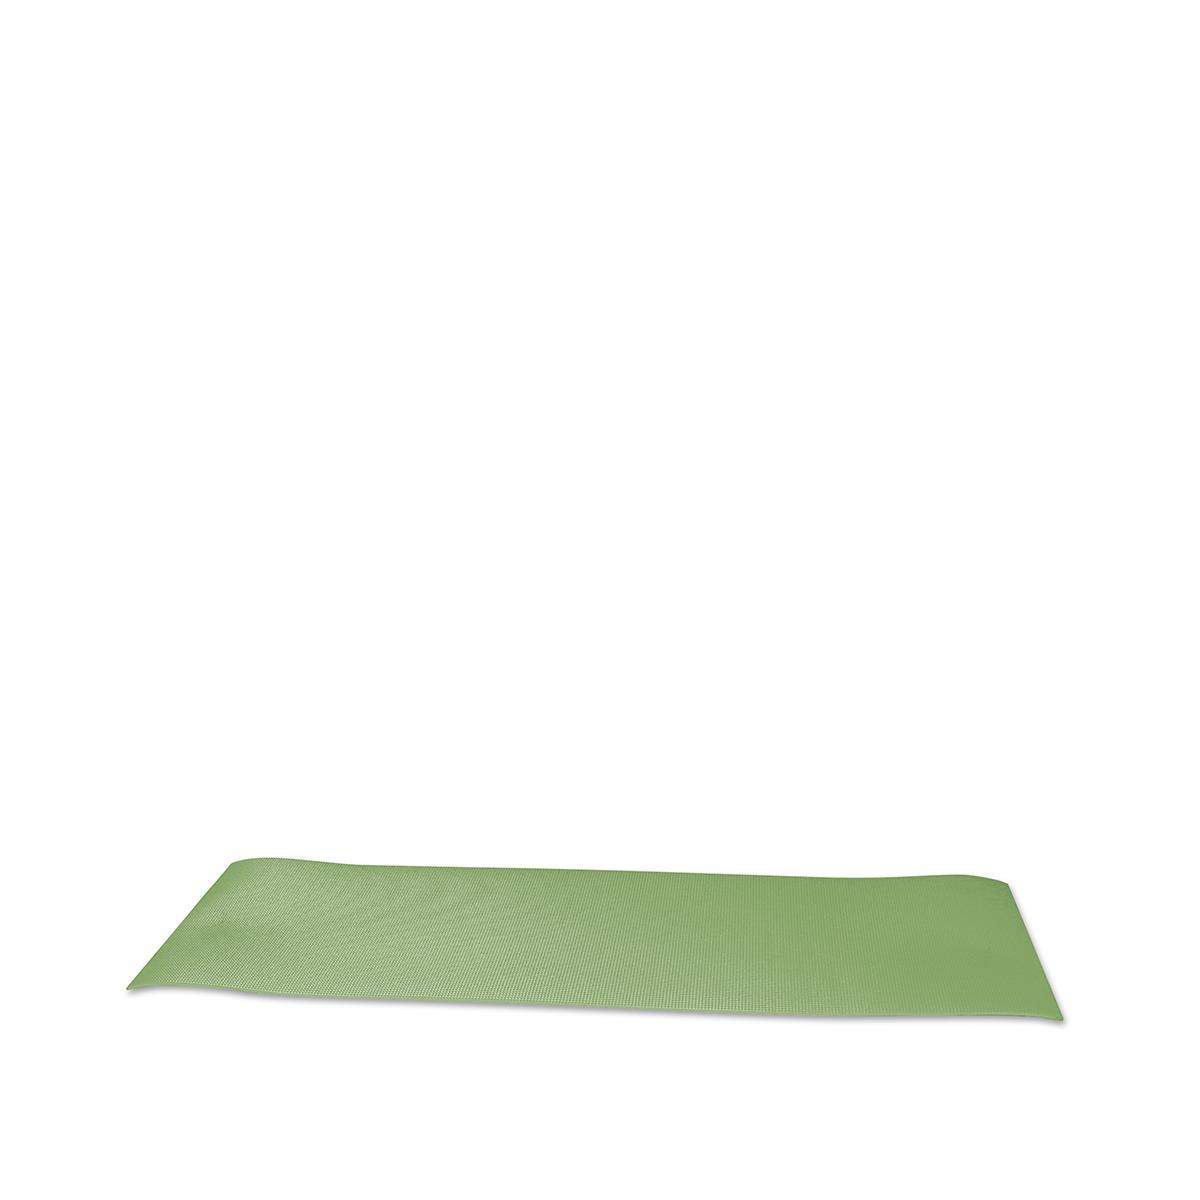 Estera Piramidal Monocolor